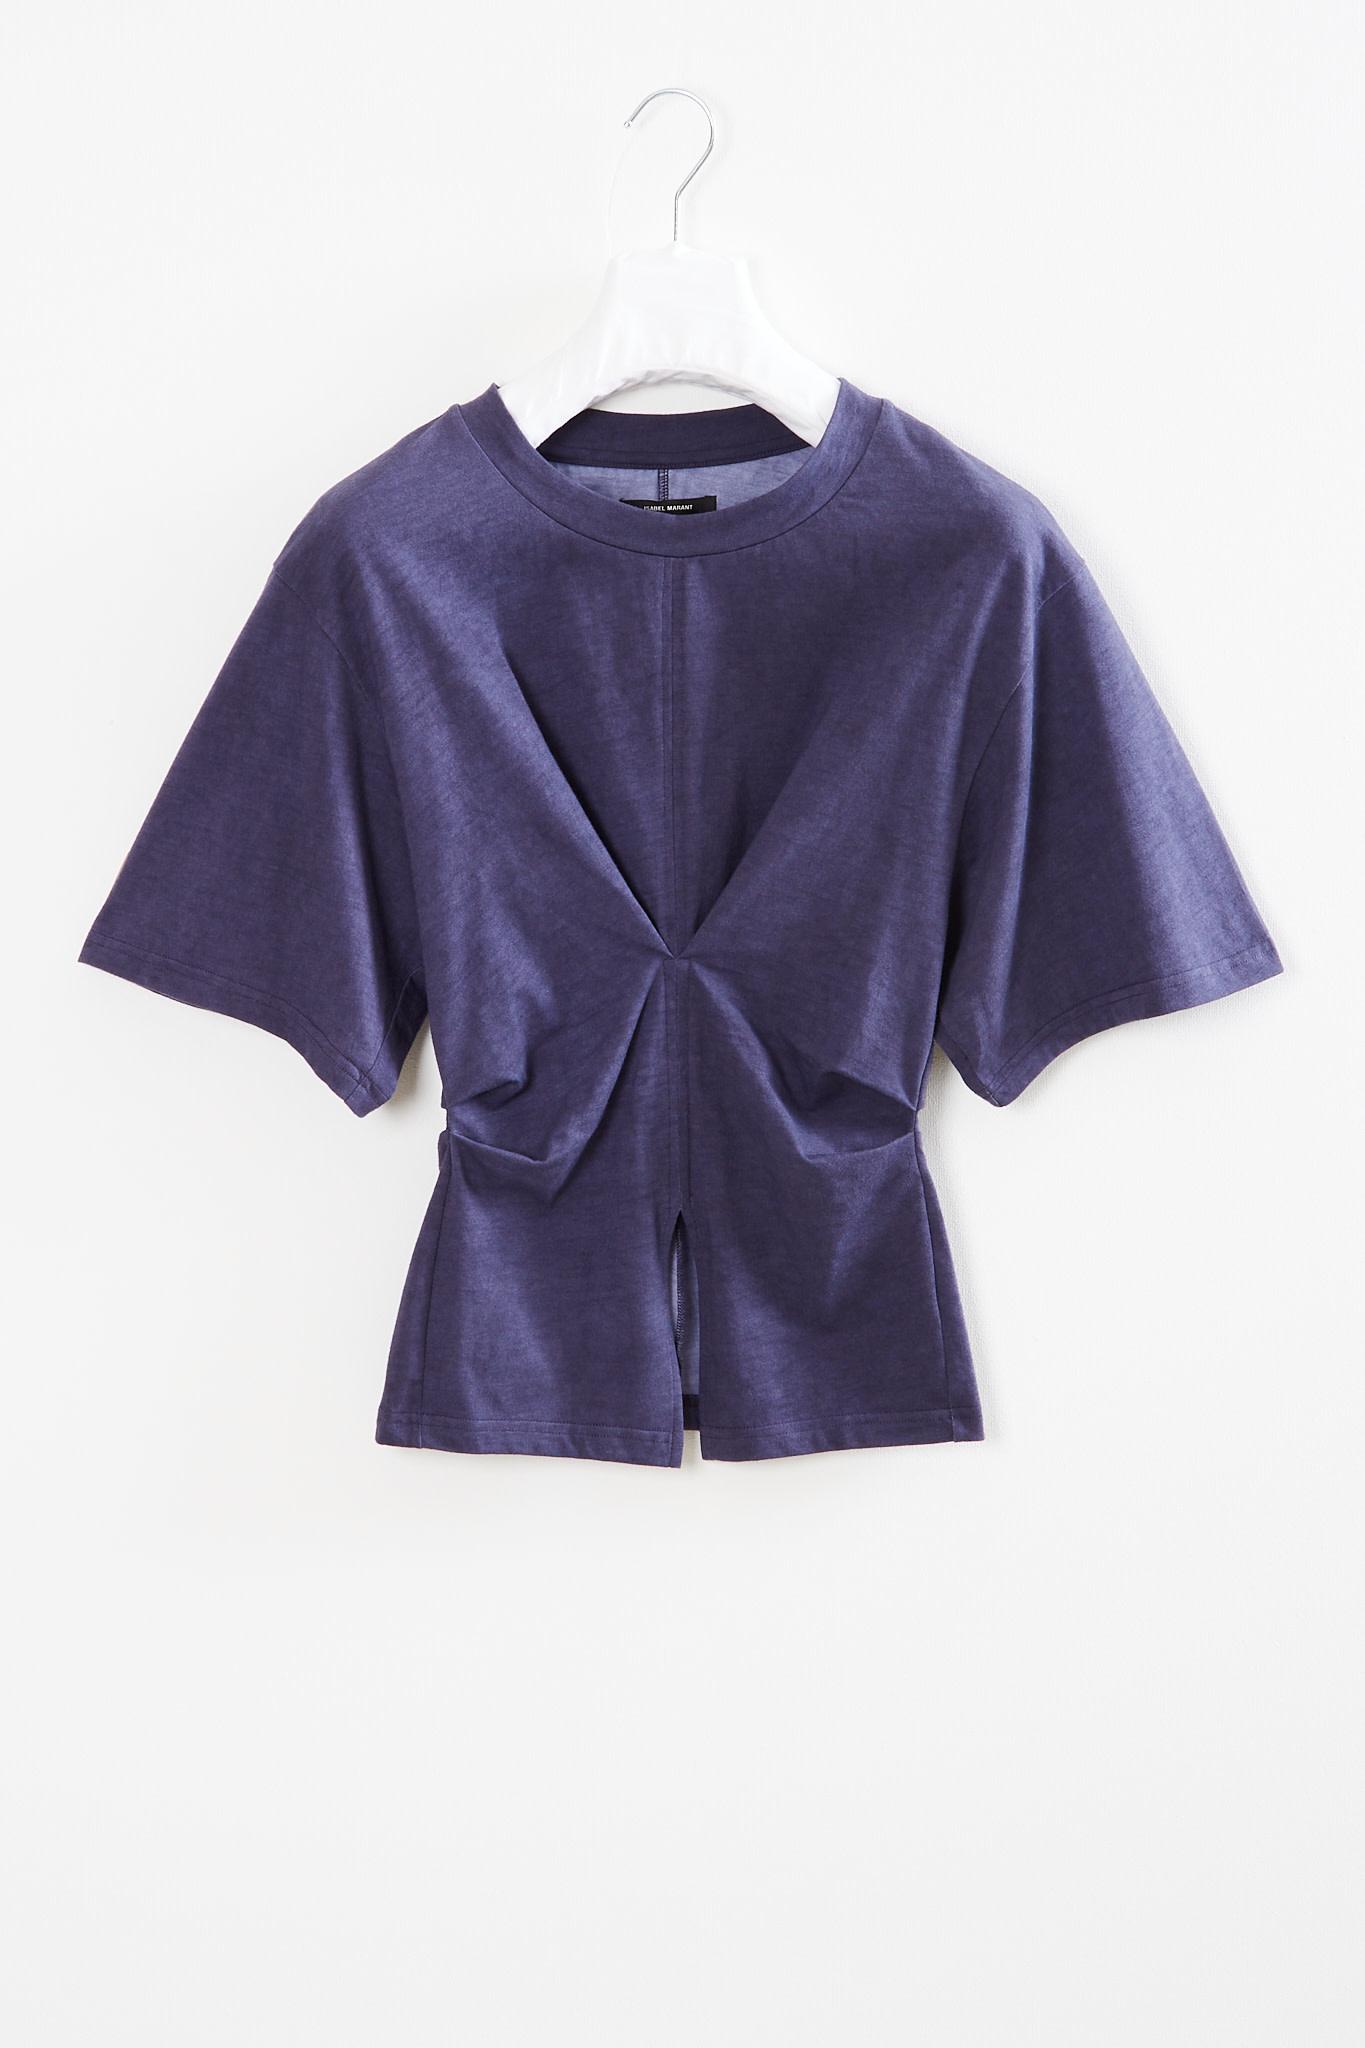 Isabel Marant Soyona colored jersey t shirt